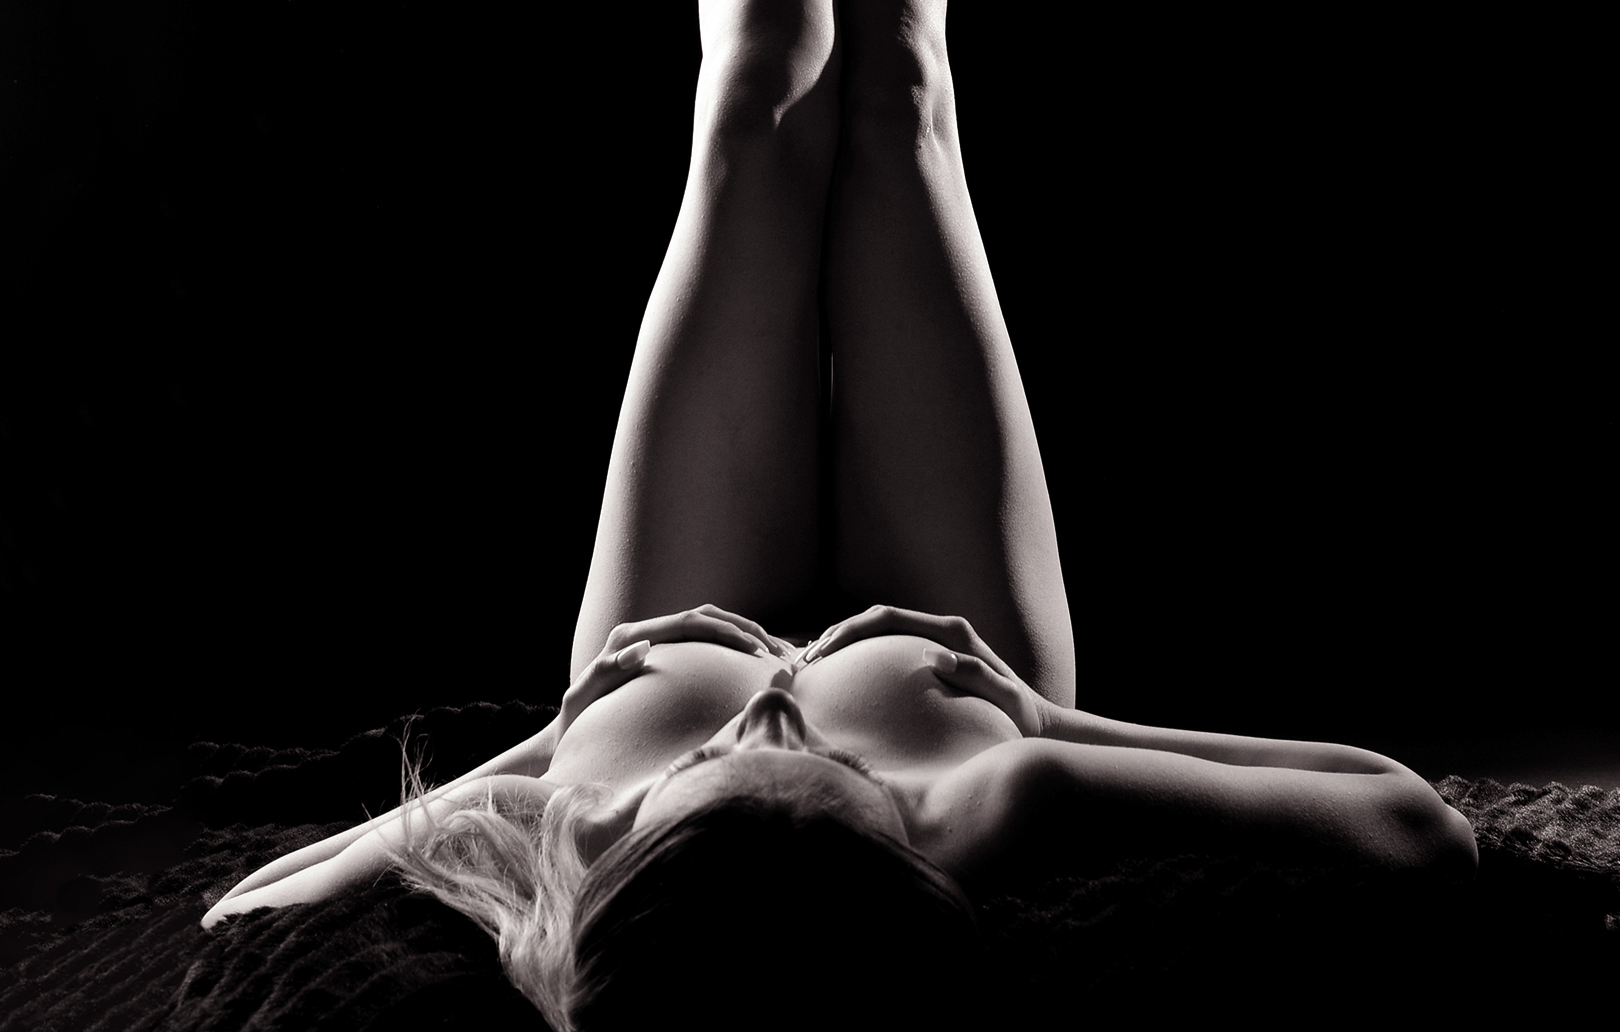 erotisches-fotoshooting-augsburg-bg31610459304